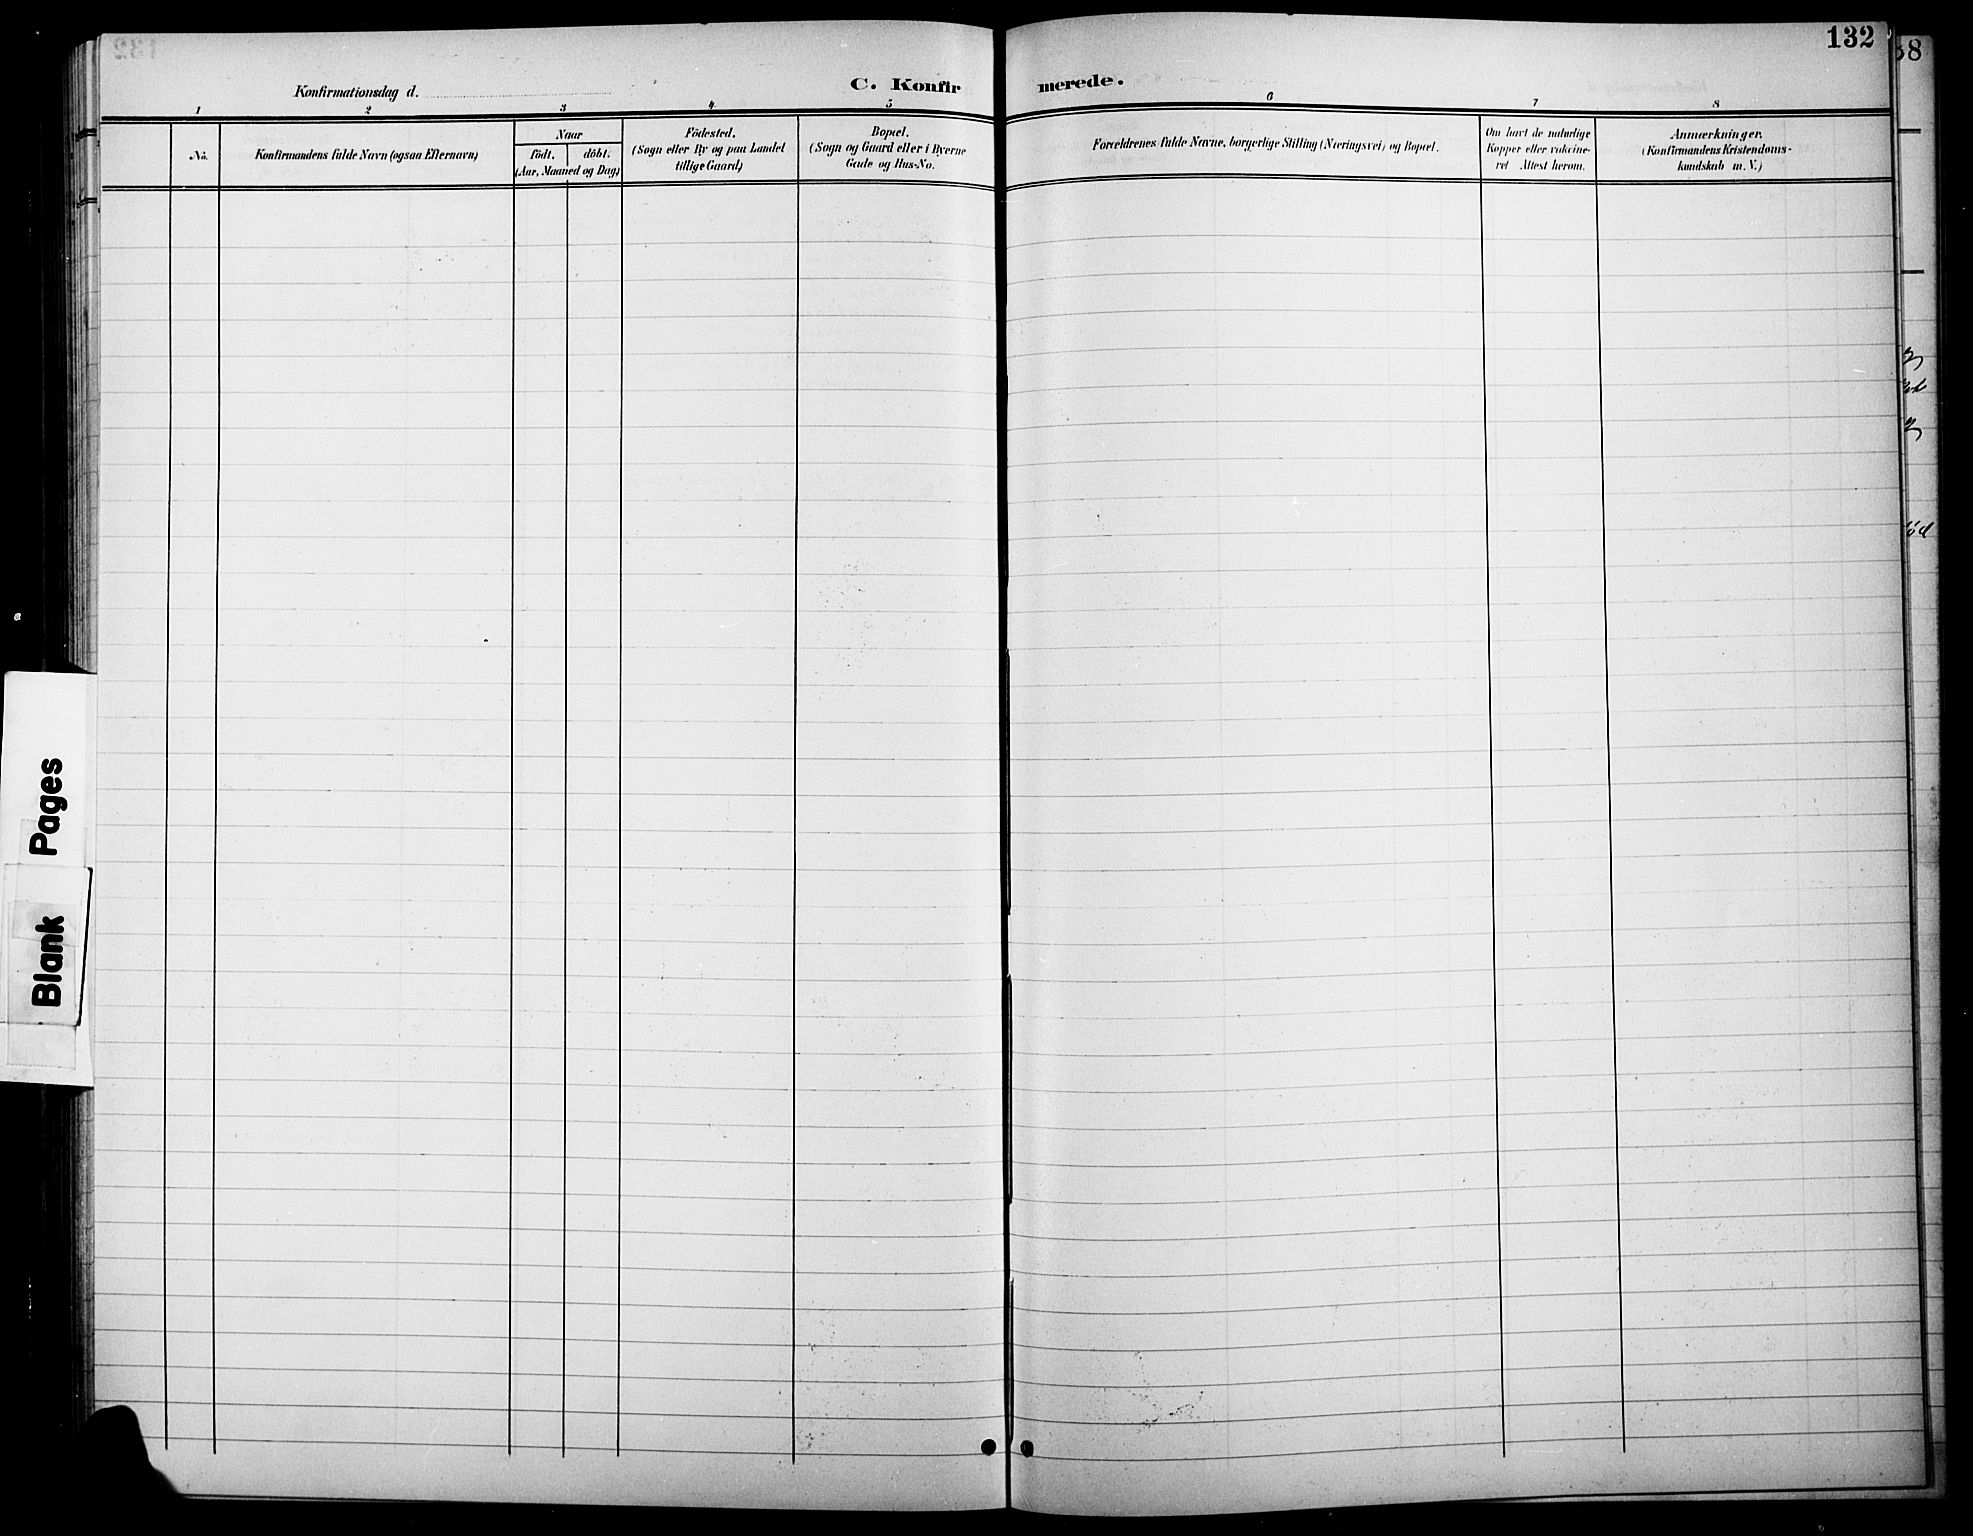 SAH, Søndre Land prestekontor, L/L0004: Klokkerbok nr. 4, 1901-1915, s. 132